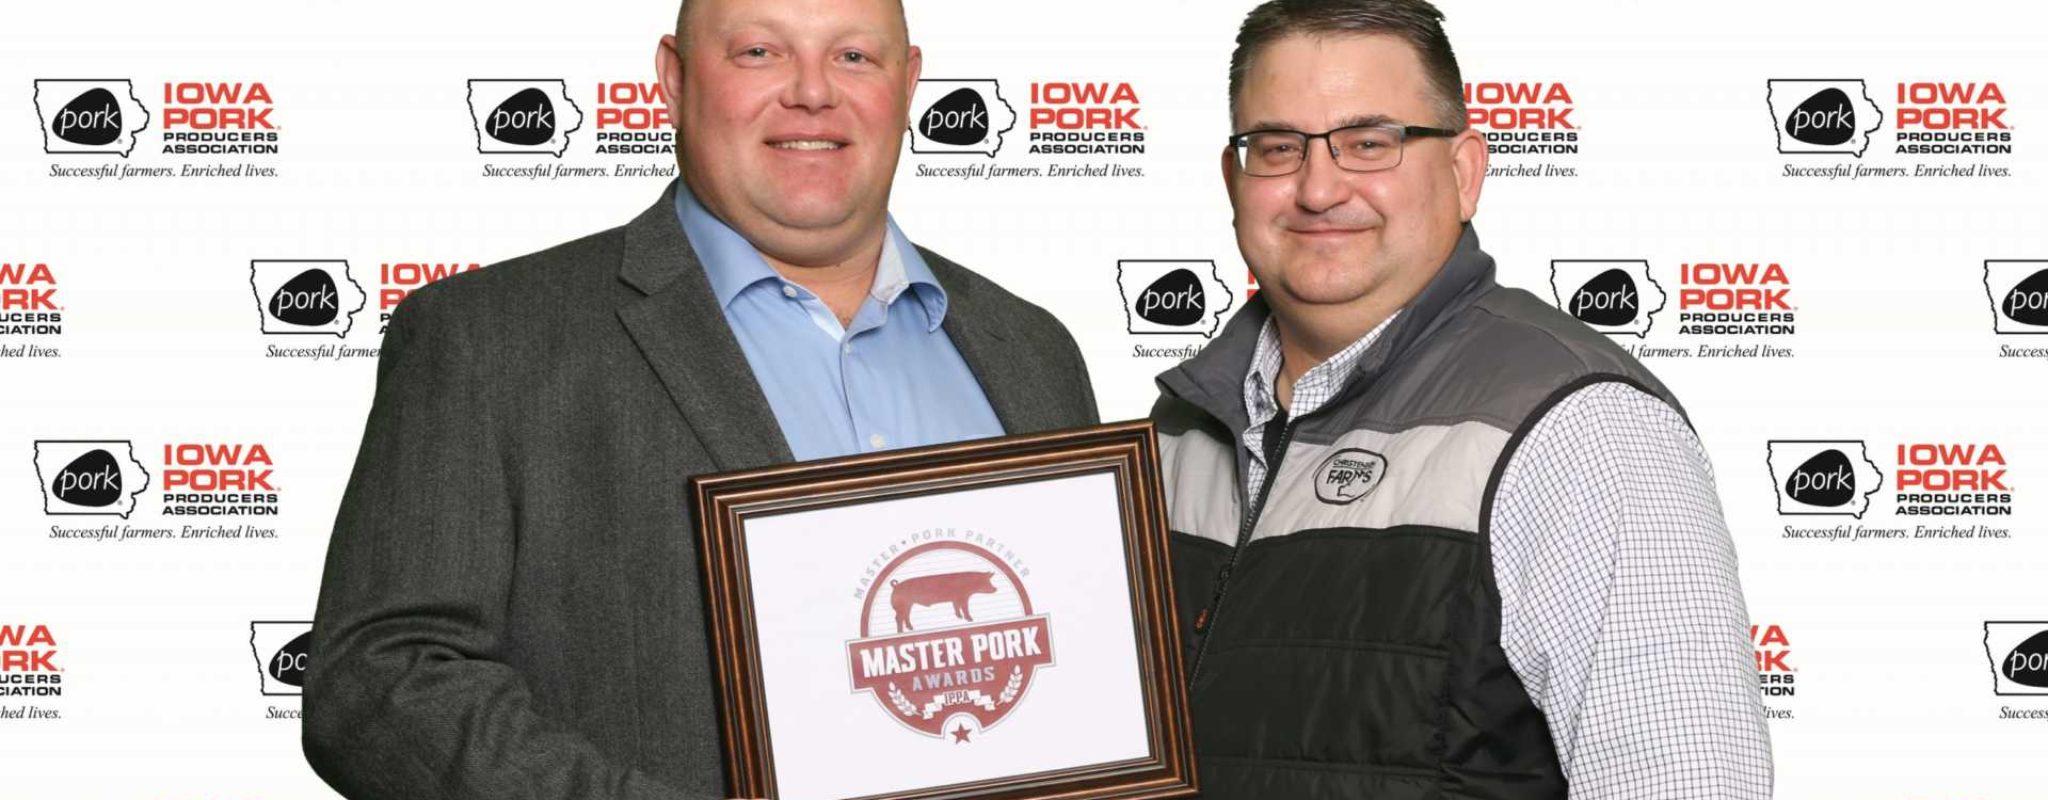 CF Livestock Hauler Recognized as Iowa Master Pork Partner